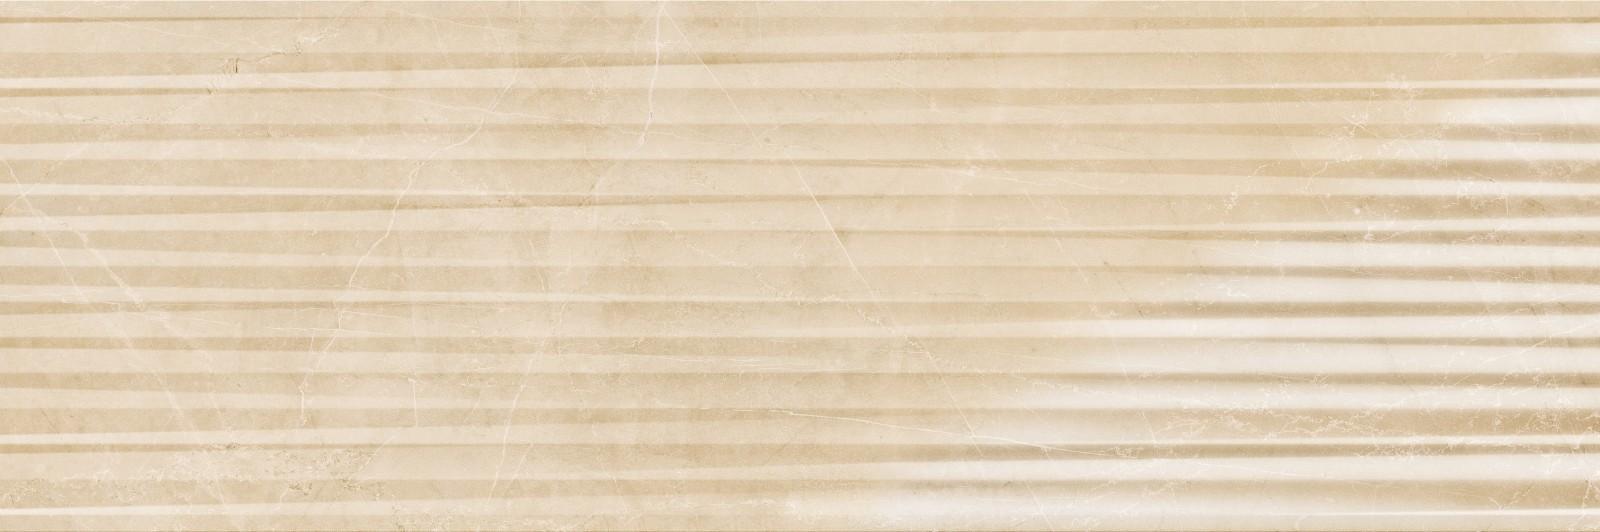 Стенни плочки Evolutionmarble Golden Cream Struttura Infinity 3D 32,5x97,7